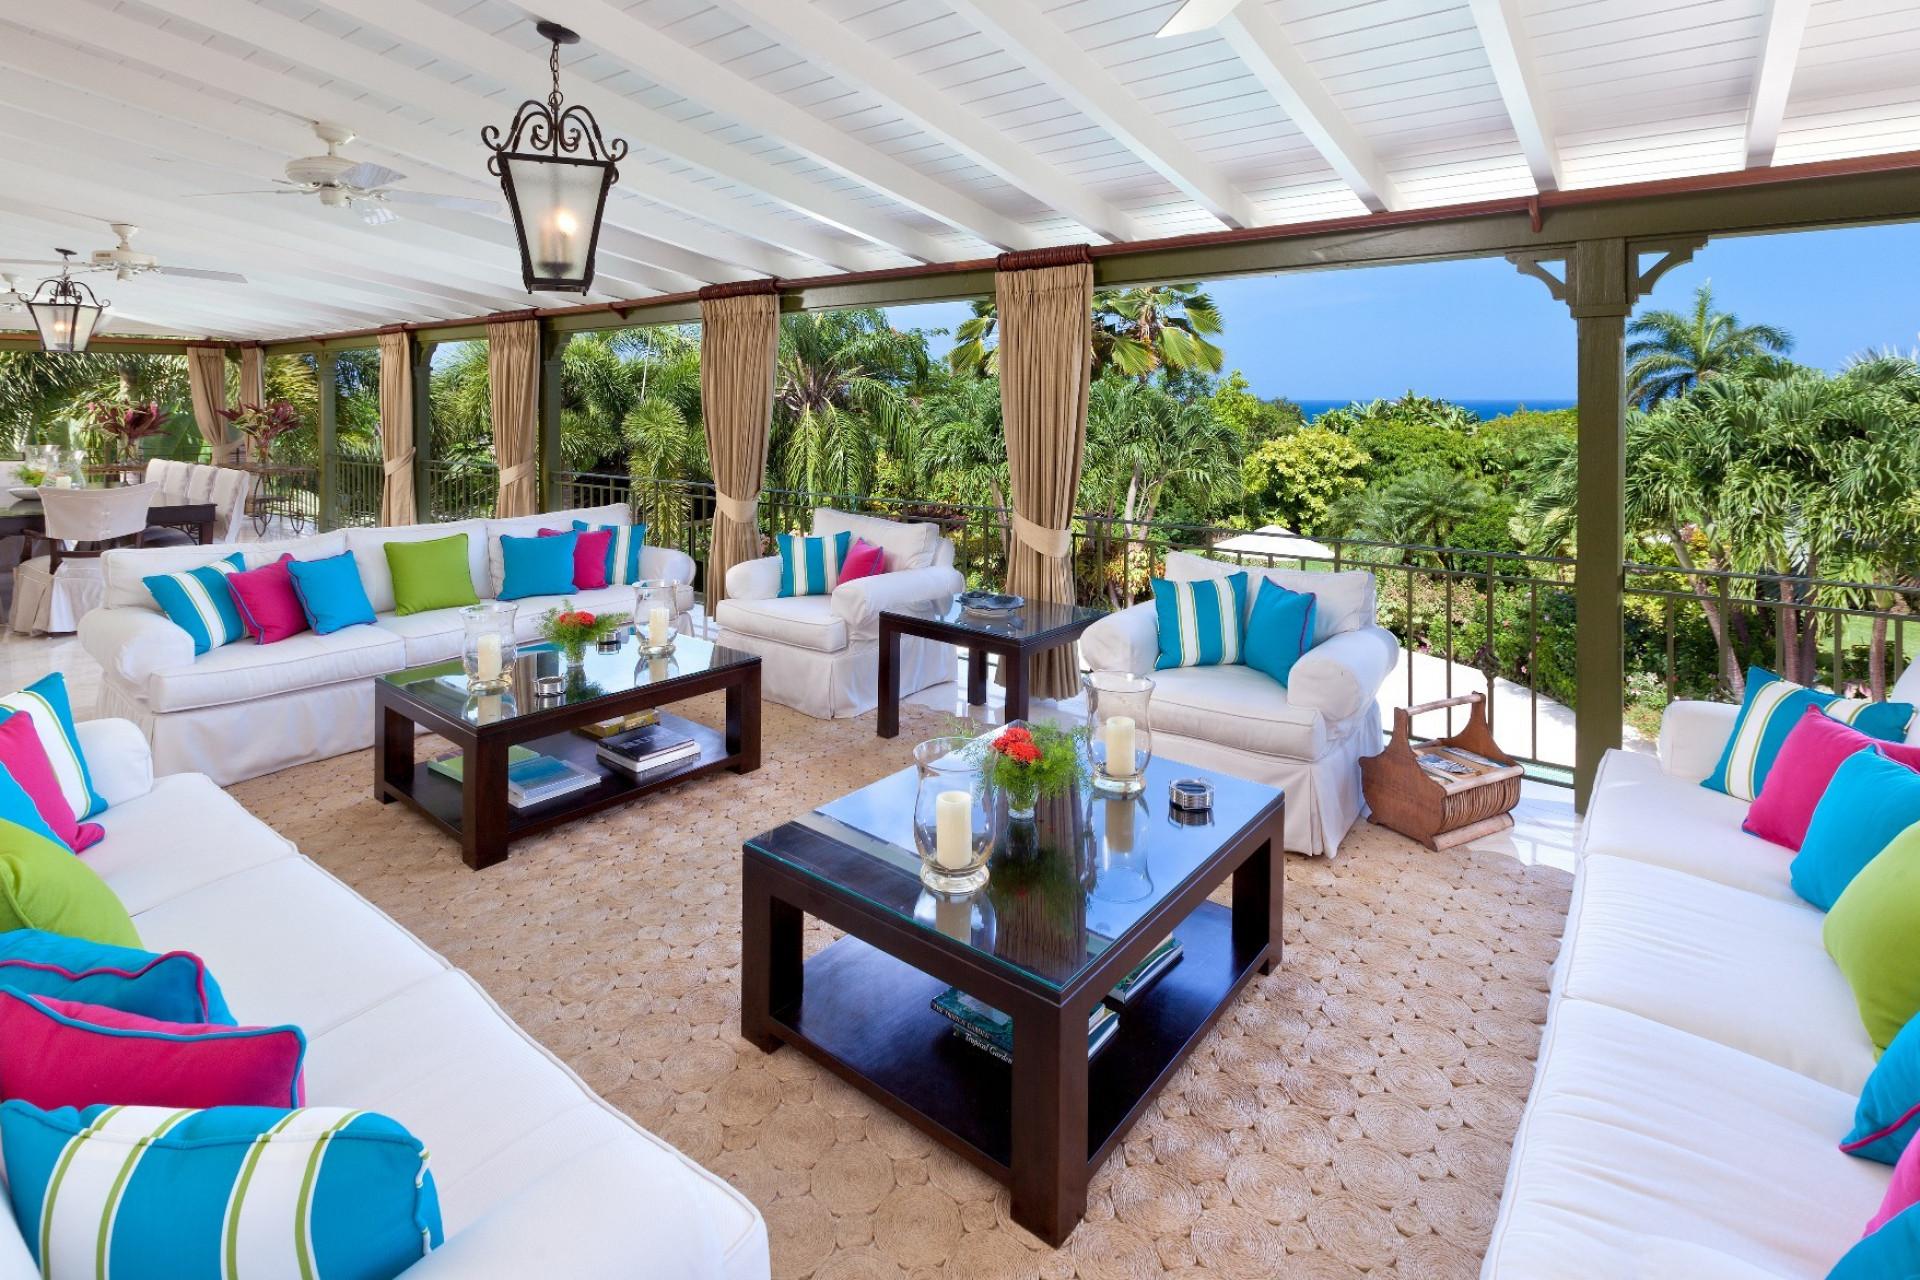 Luxury 5 Bedroom Villa Sugar Hill Large Swimming Pool & Tropical Garden